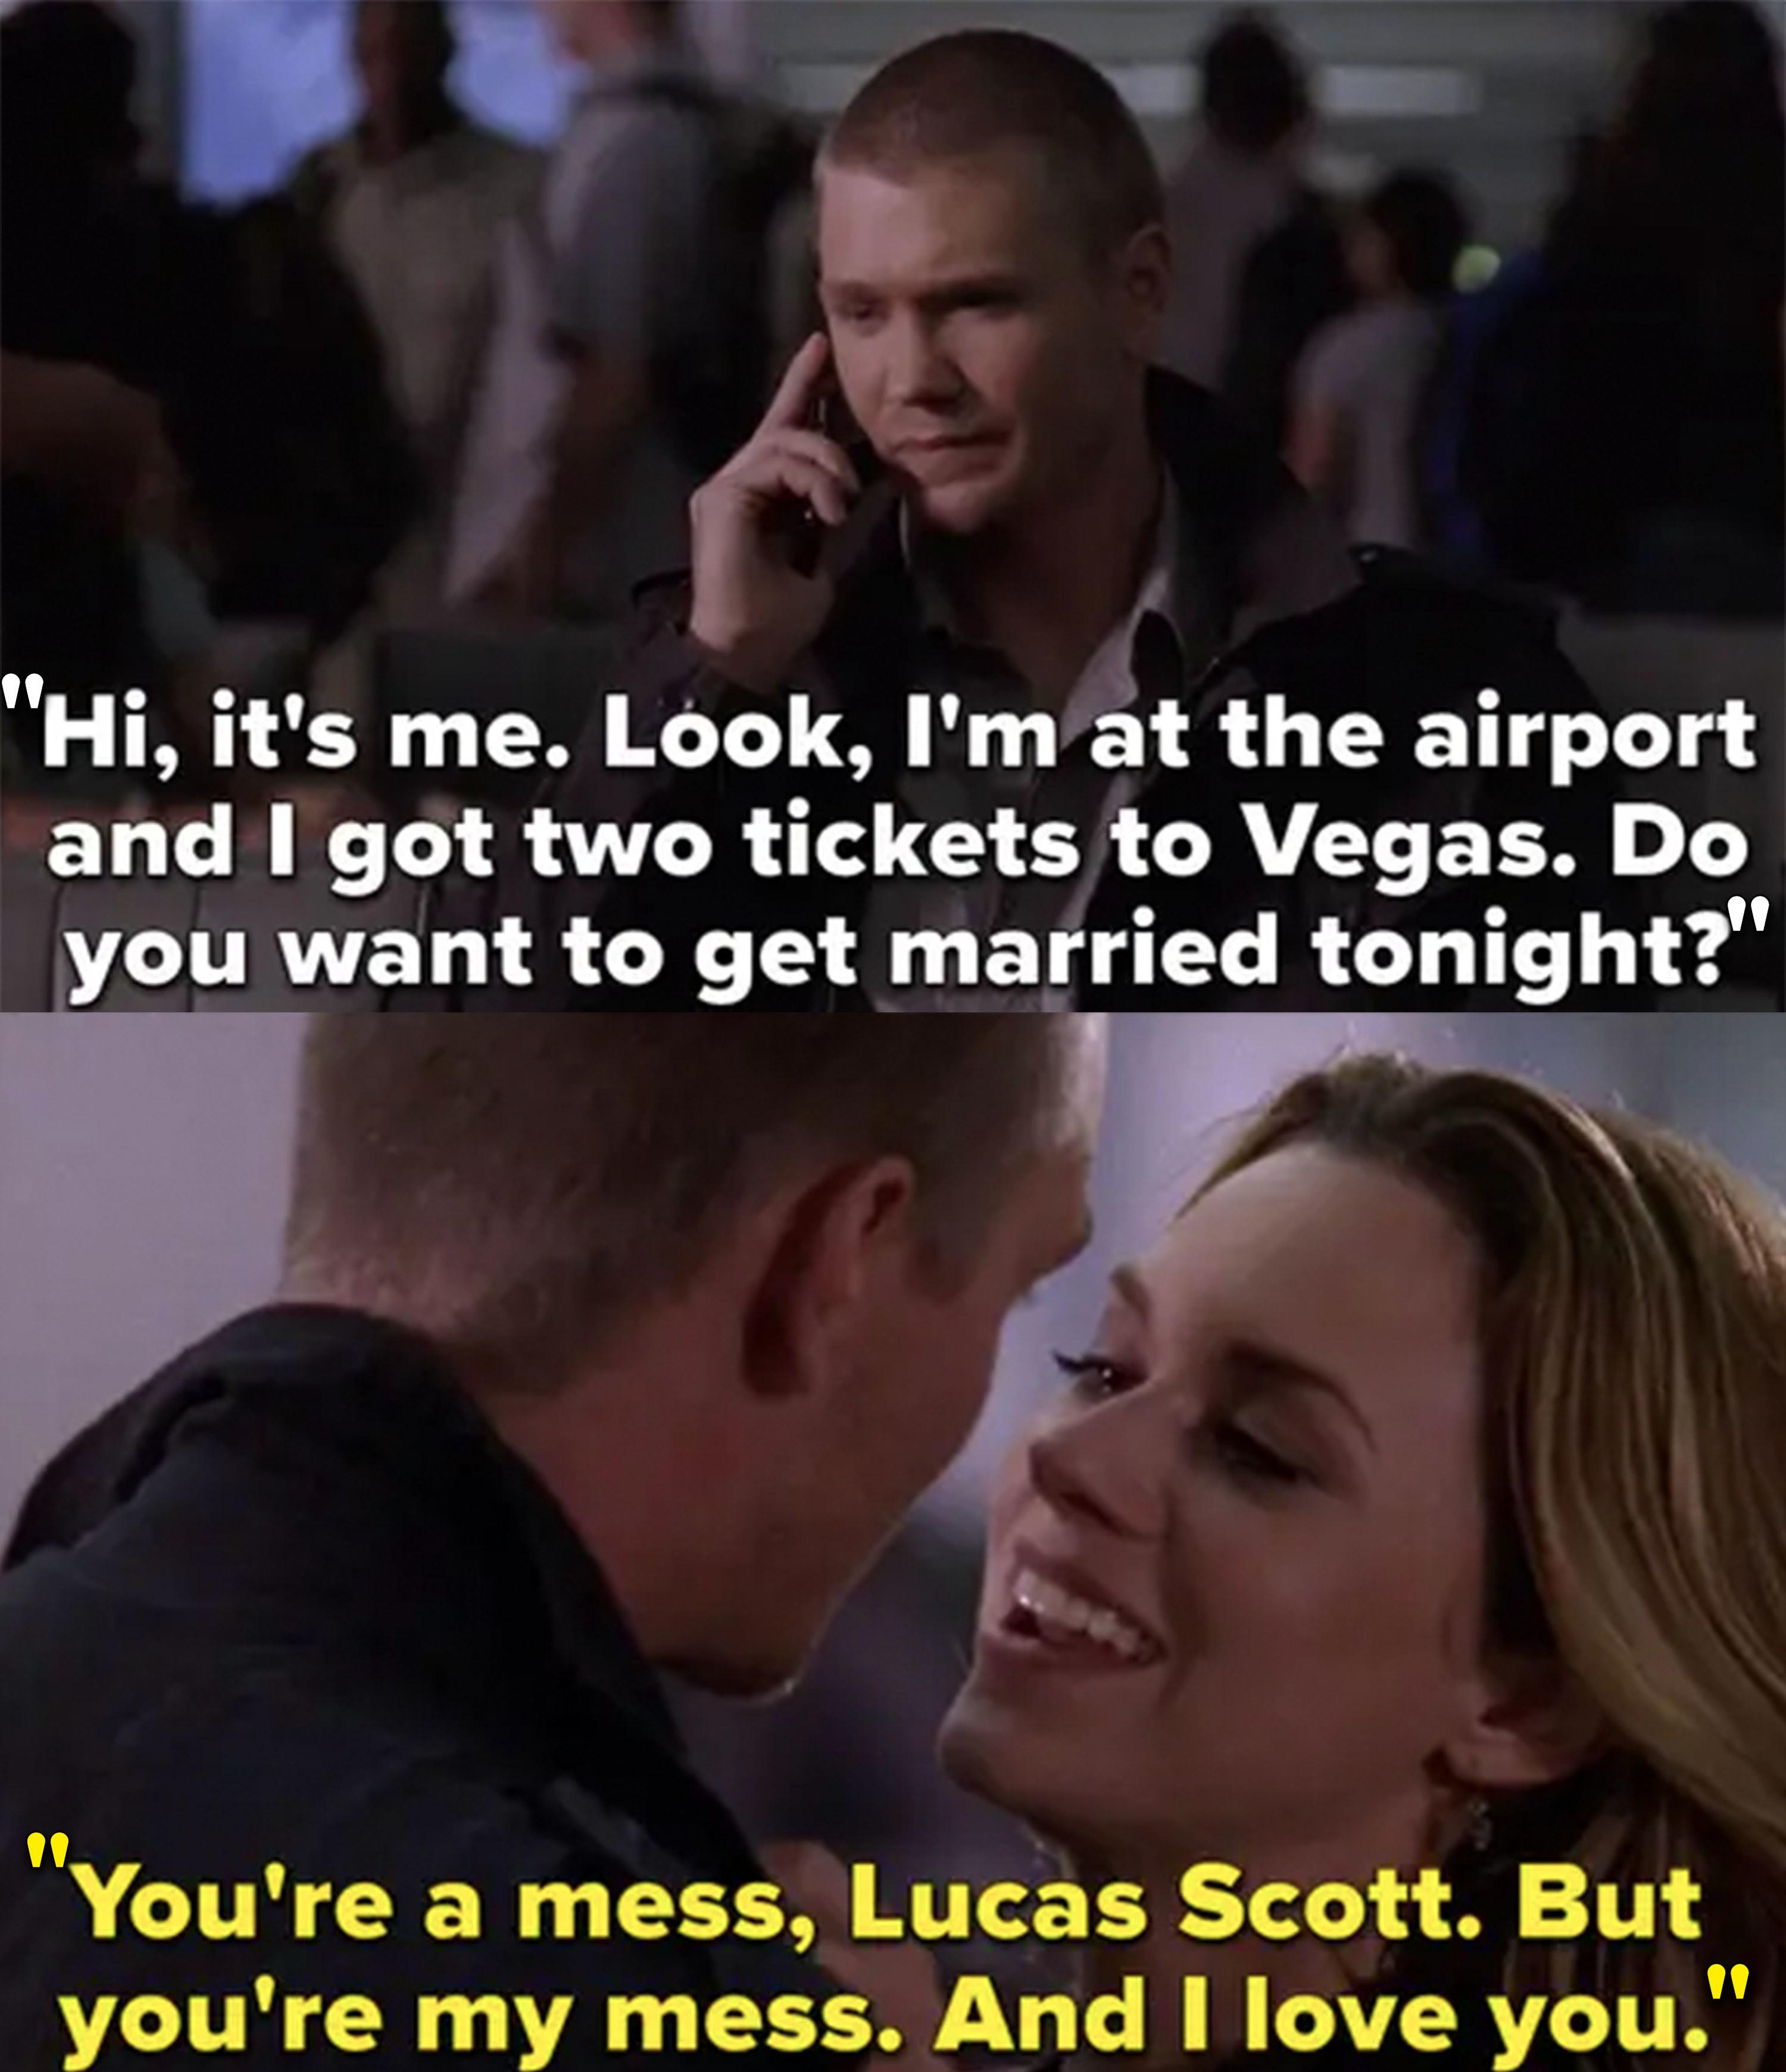 Lucas spontaneously asks Peyton to elope with him in Vegas